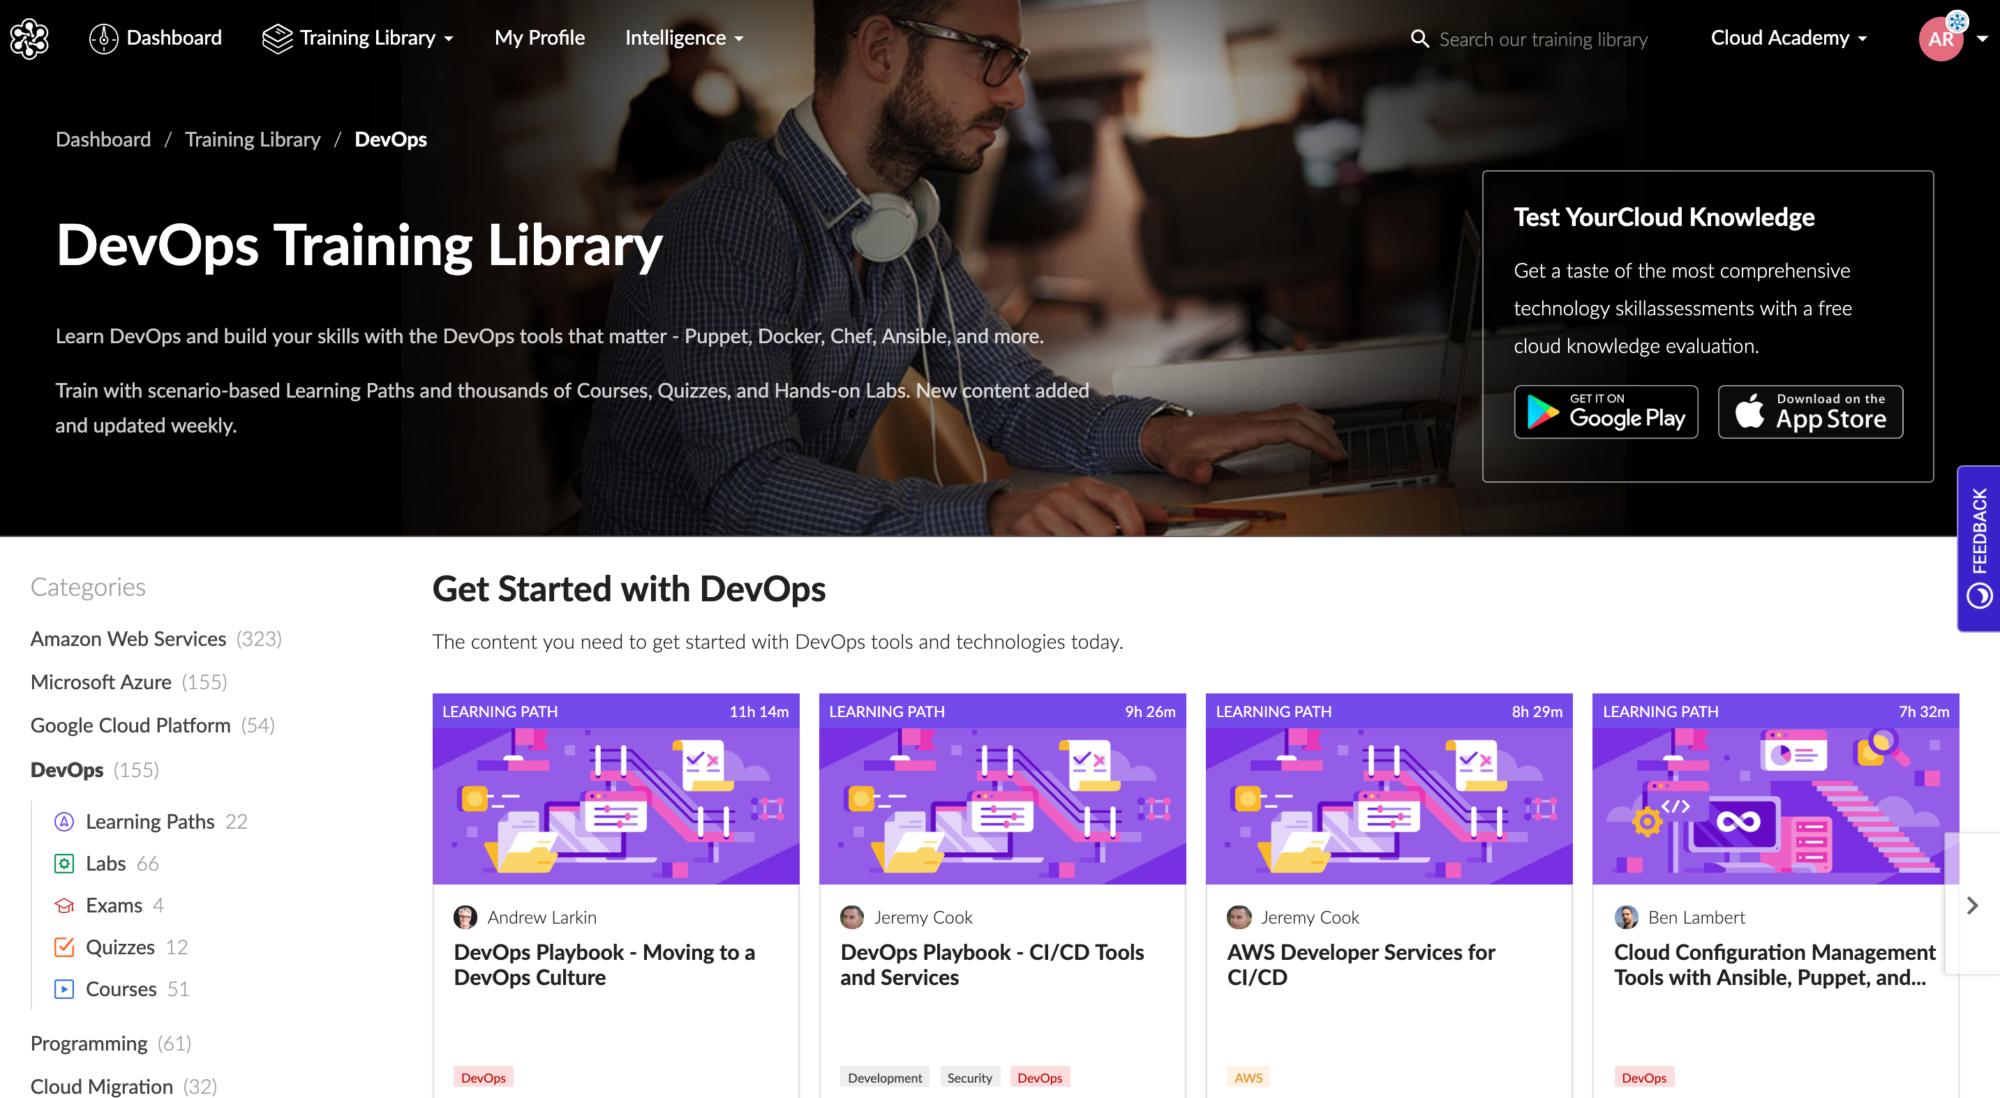 Cloud Academy DevOps Training Library